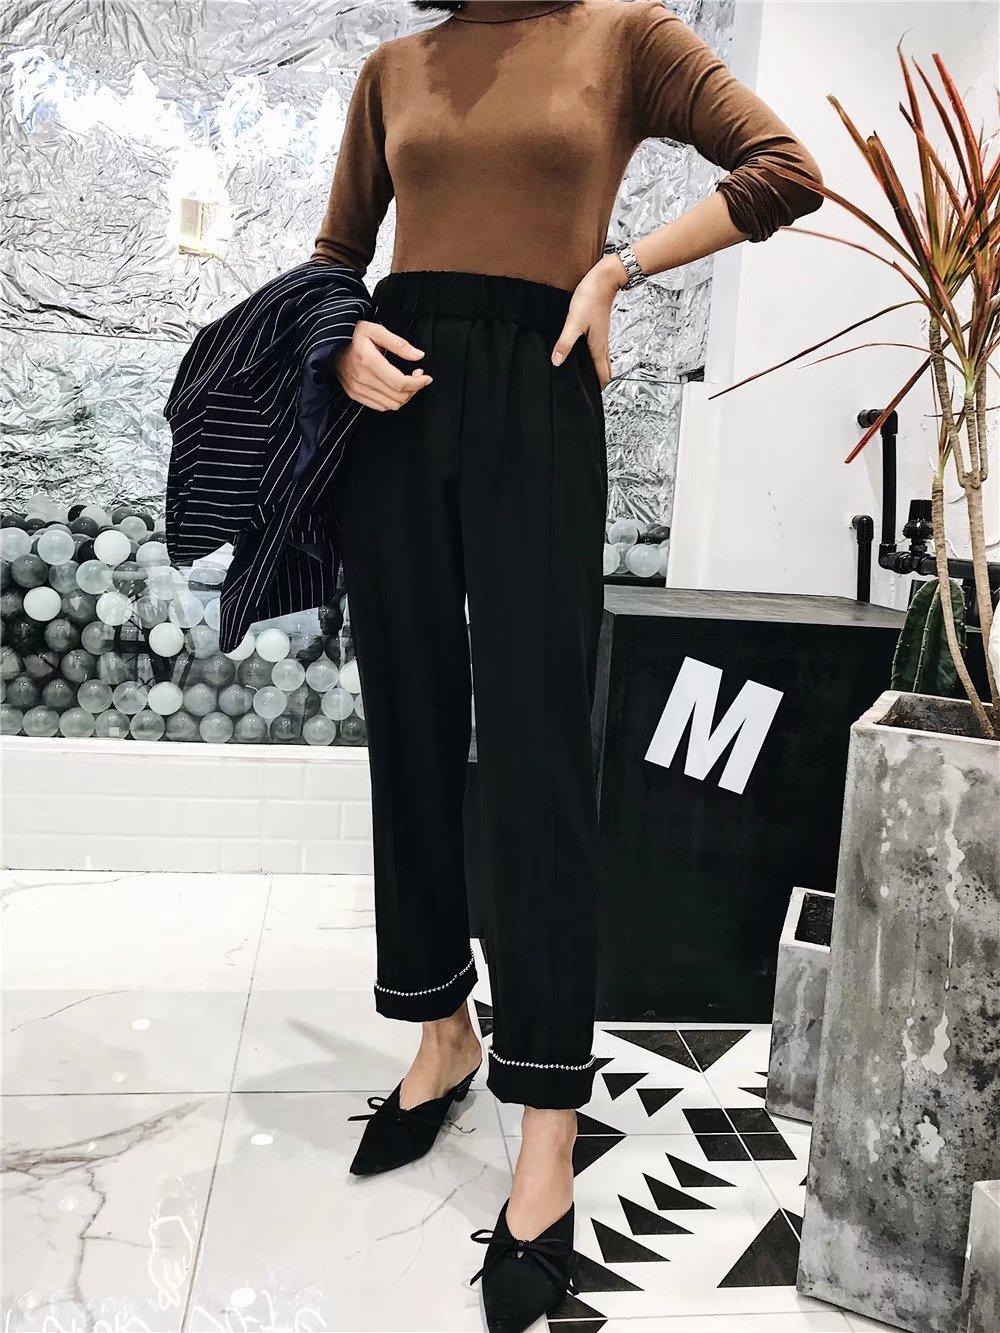 Cotton Fashionpants(Black-S) NHAM2529-Black-S